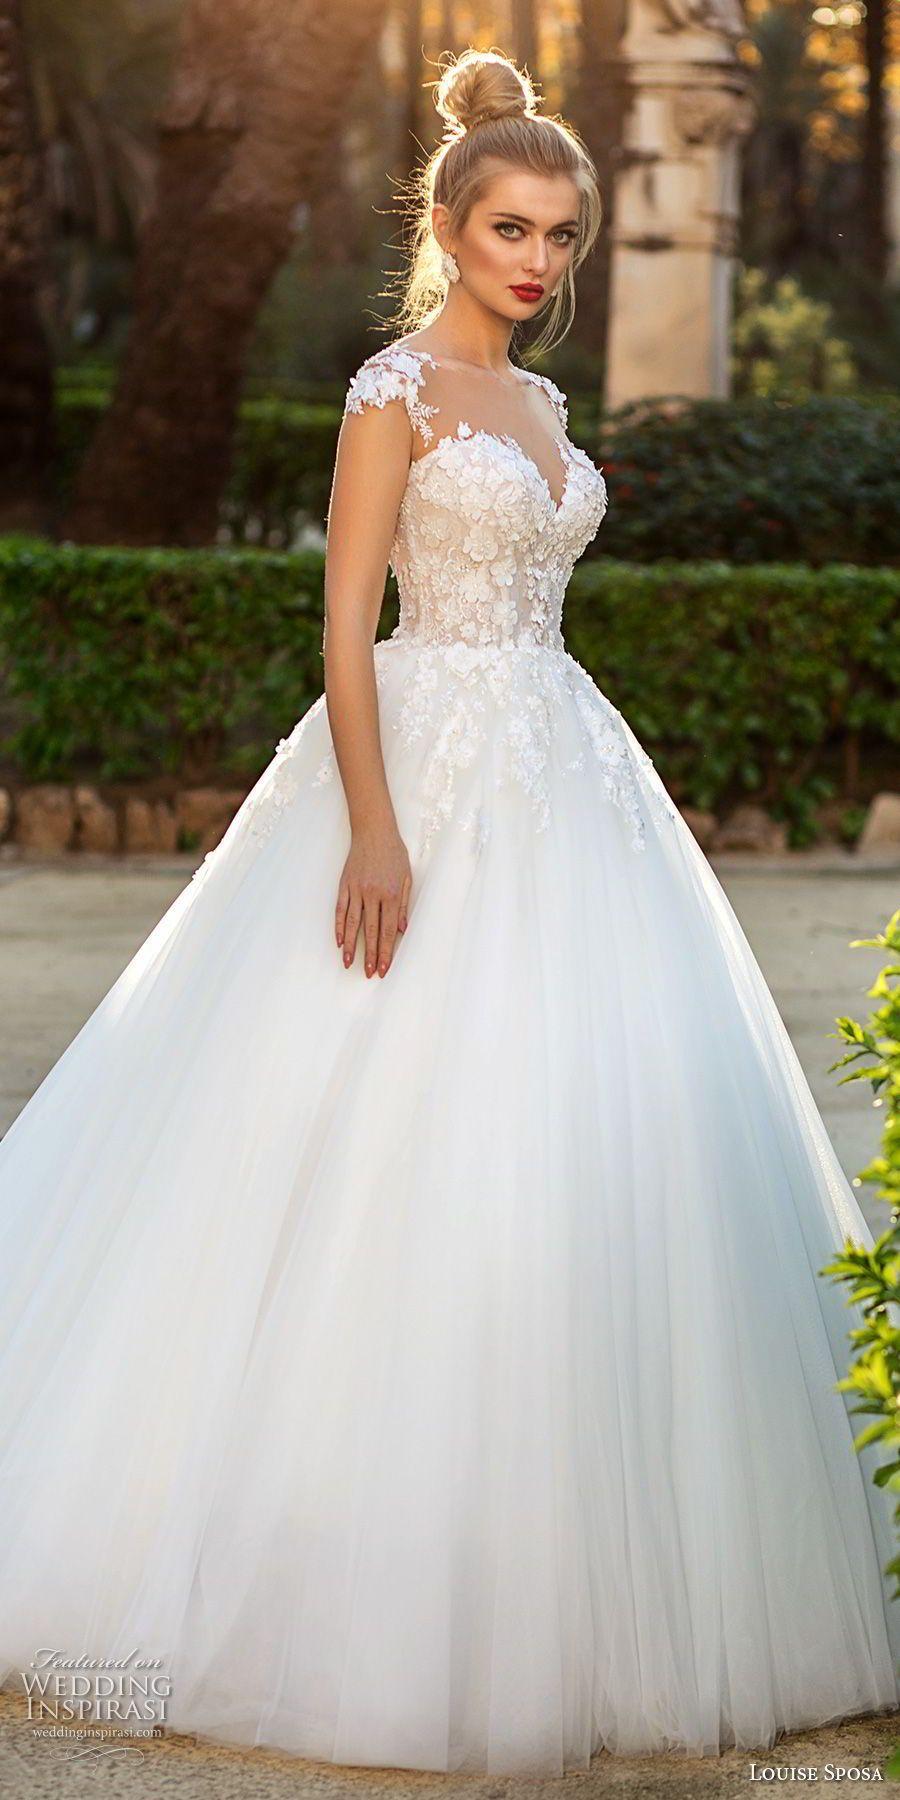 Louise sposa bridal cap sleeves illusion bateau sweetheart